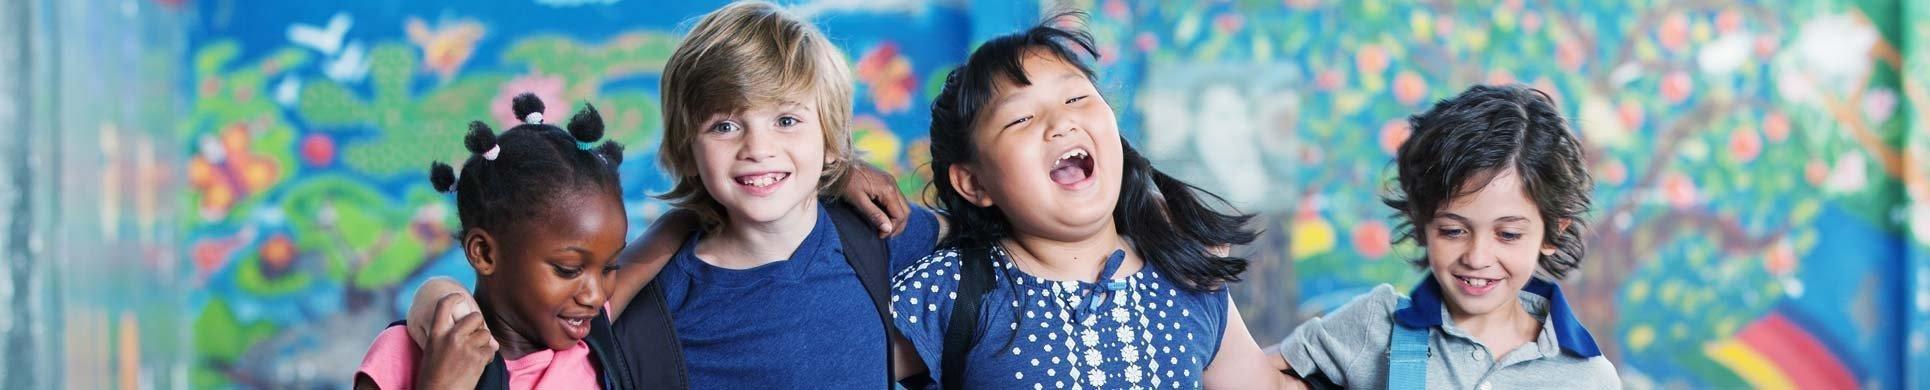 Symptoms Of Type 1 Diabetes In Children: Signs Of Diabetes In Children